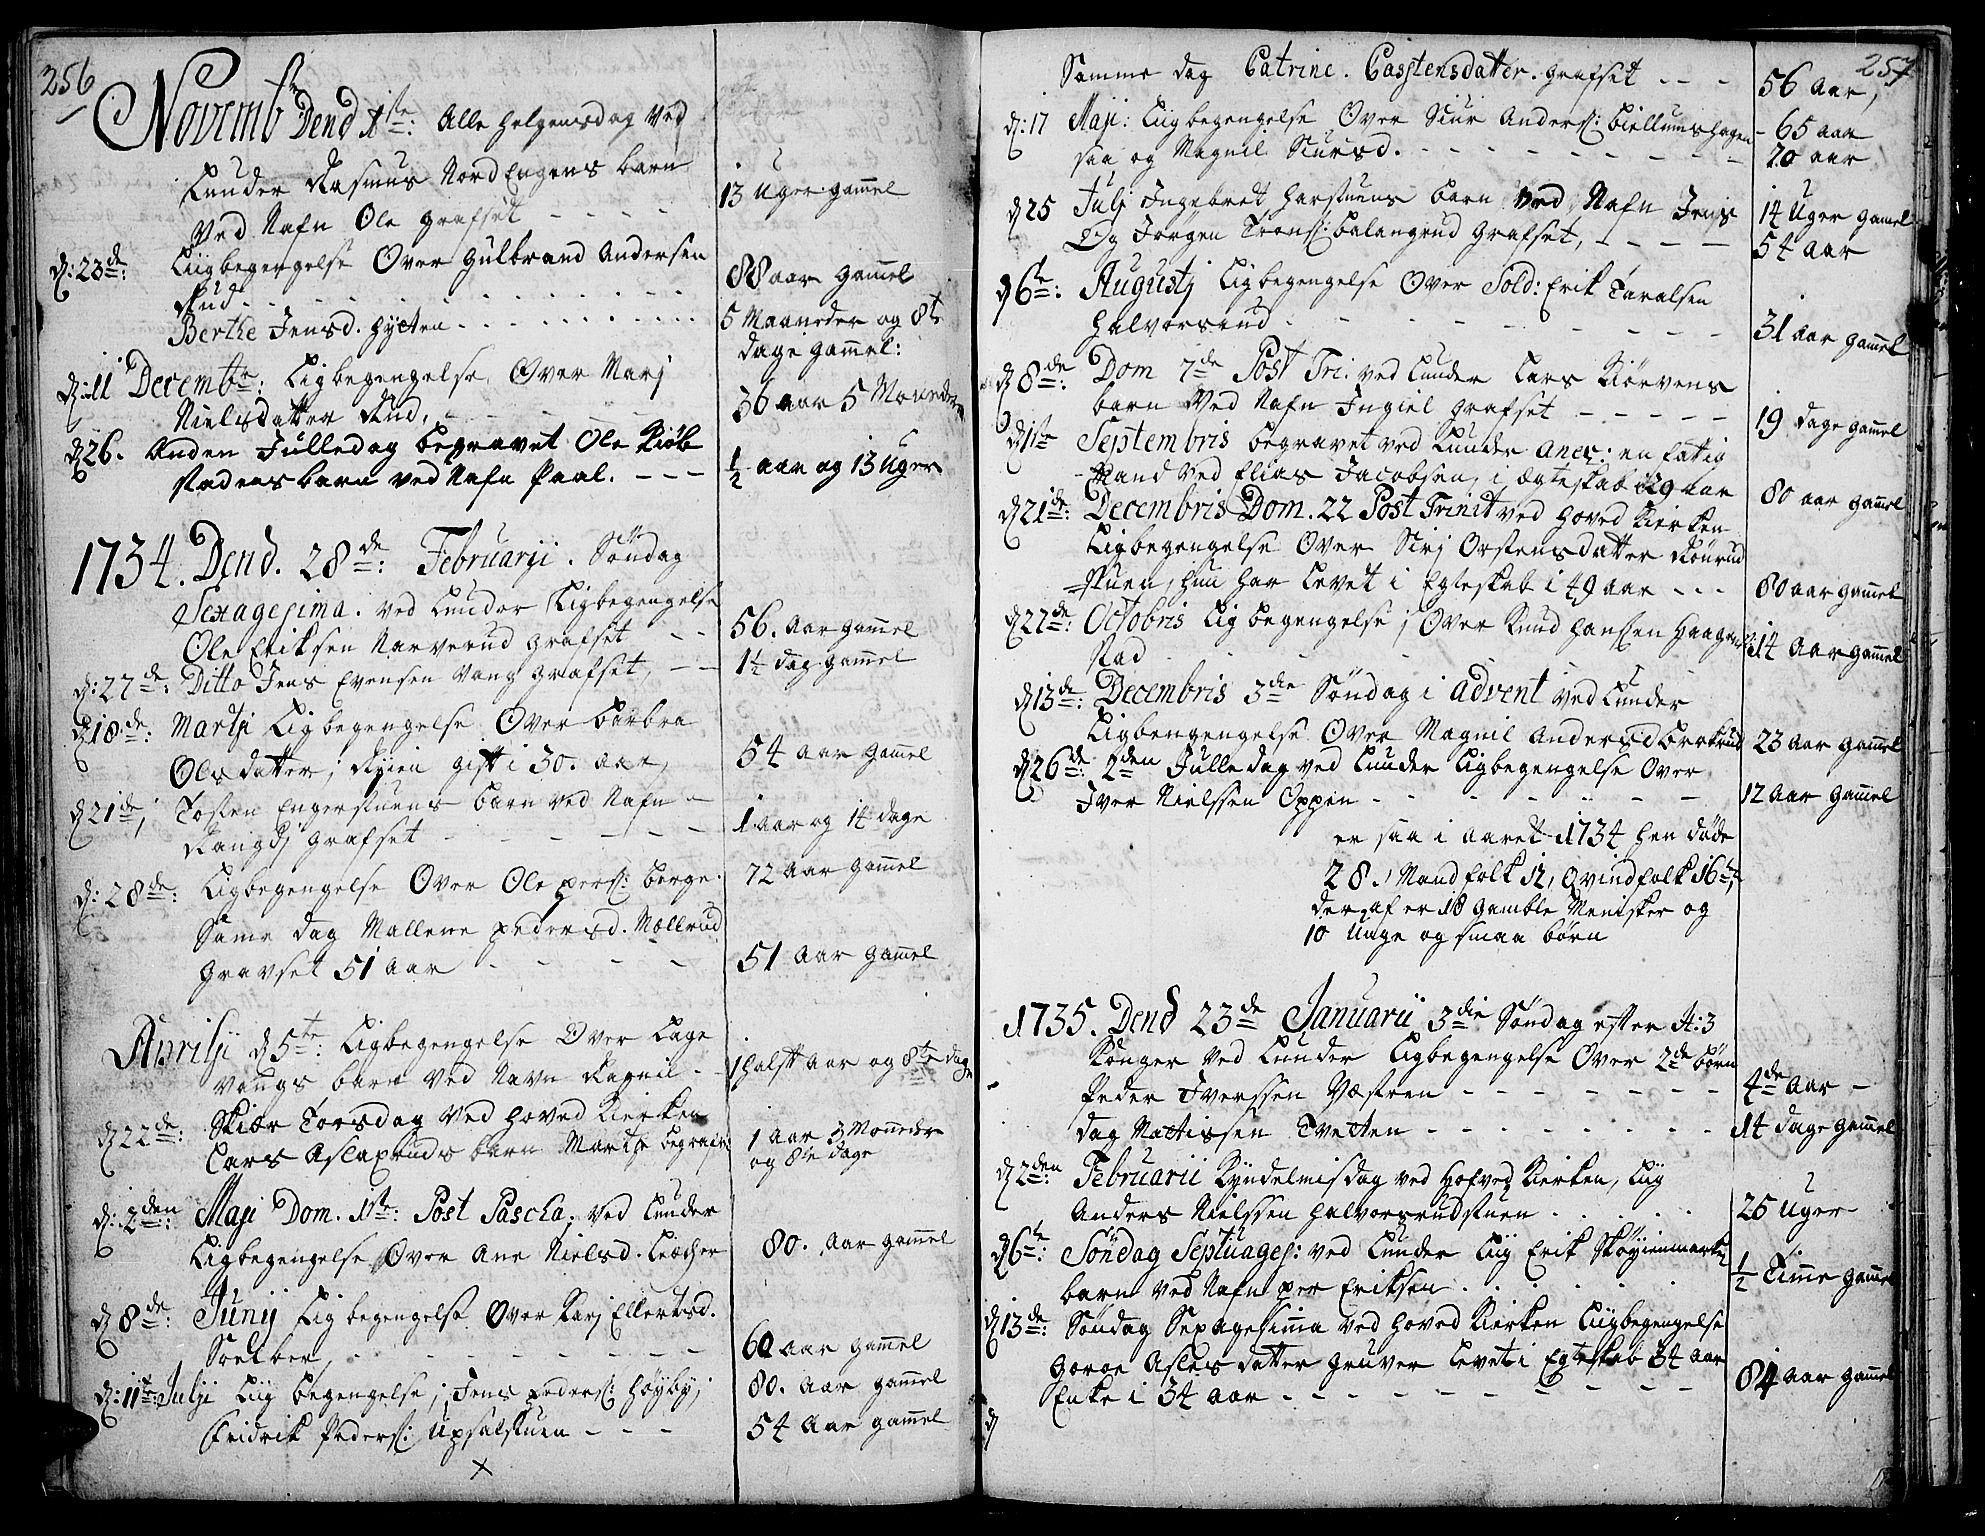 SAH, Jevnaker prestekontor, Ministerialbok nr. 2, 1725-1751, s. 256-257